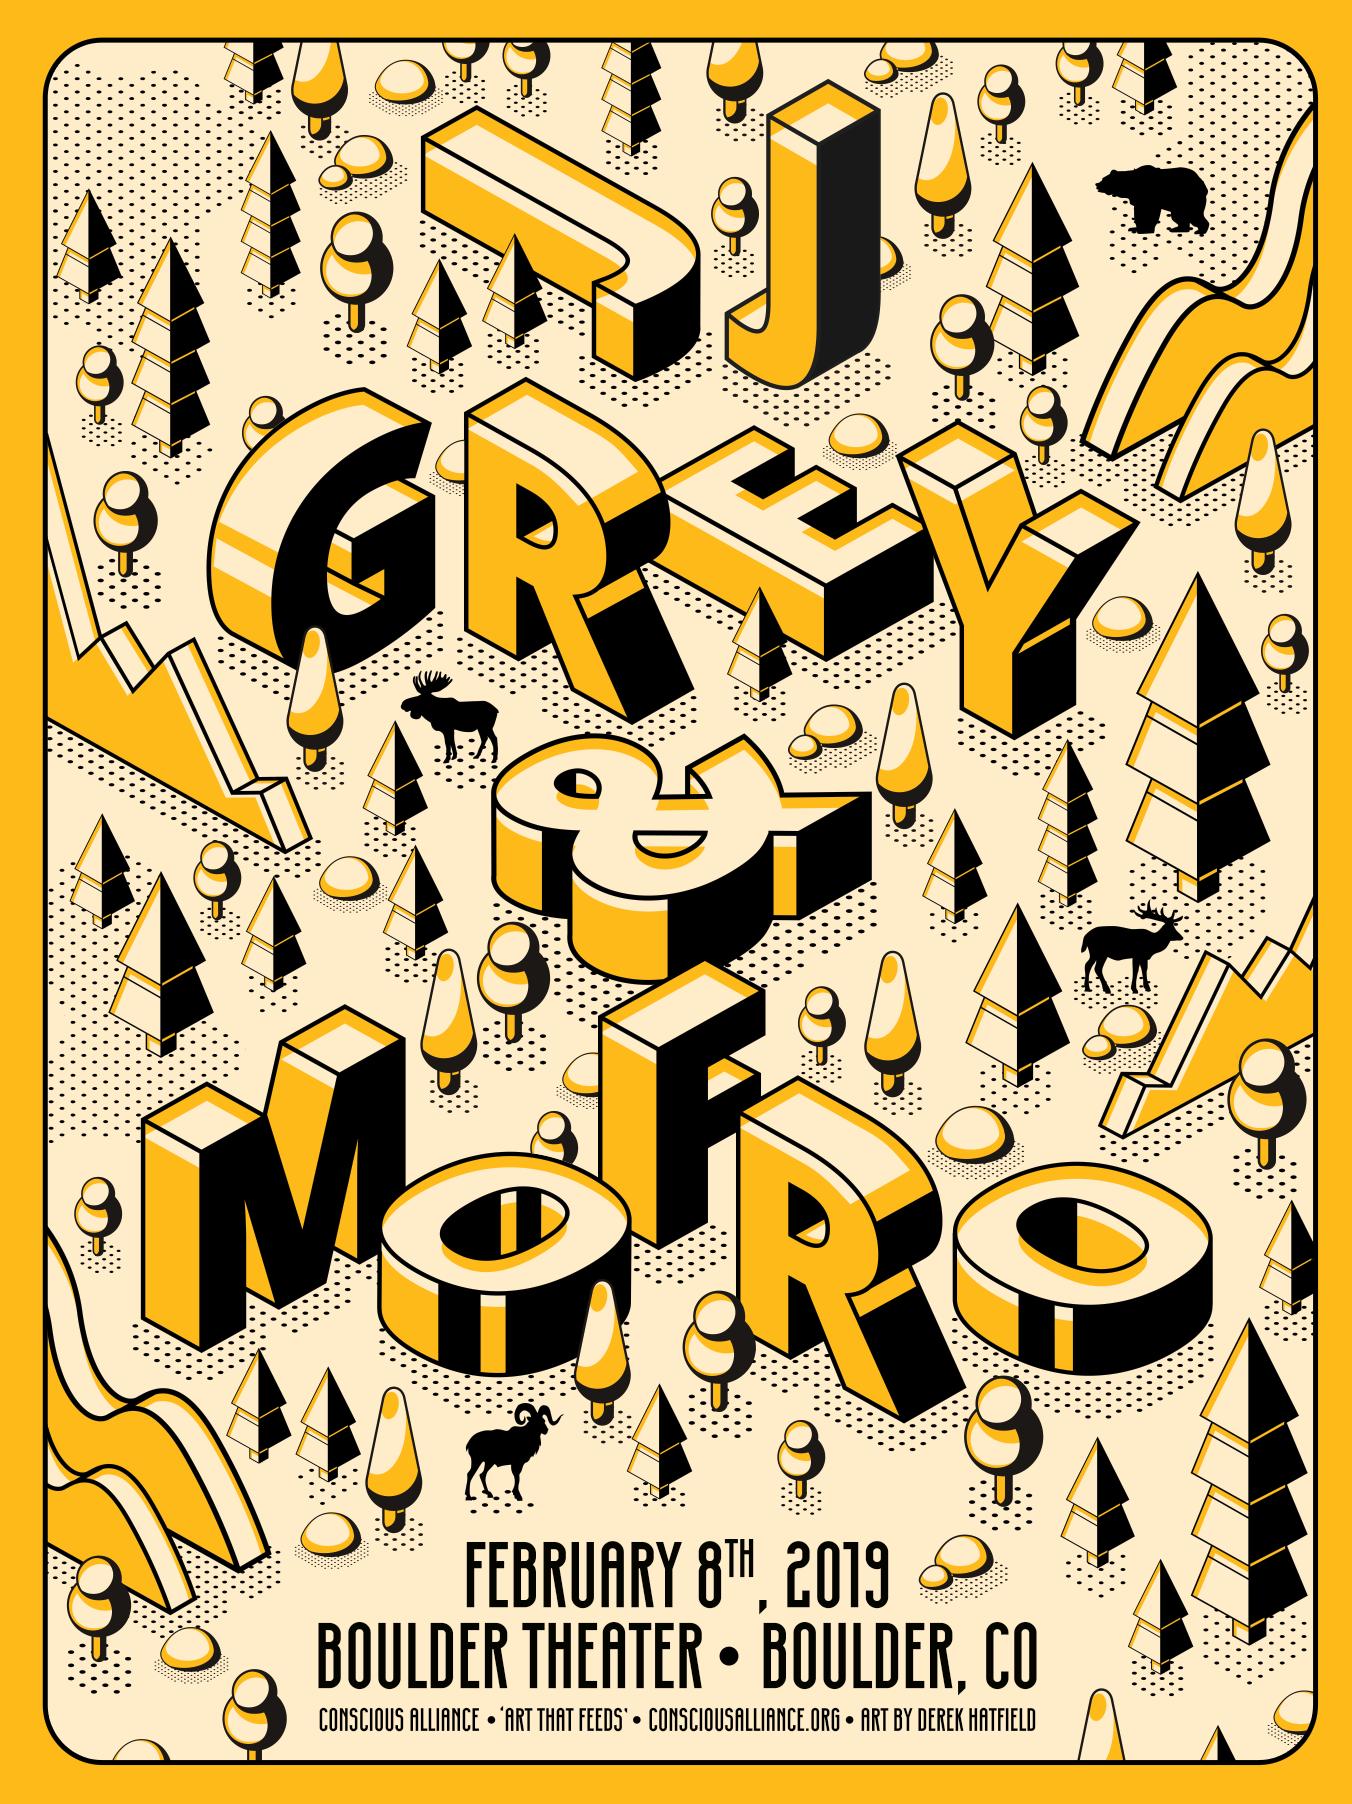 JJ Grey & Mofro - 2.8.2019